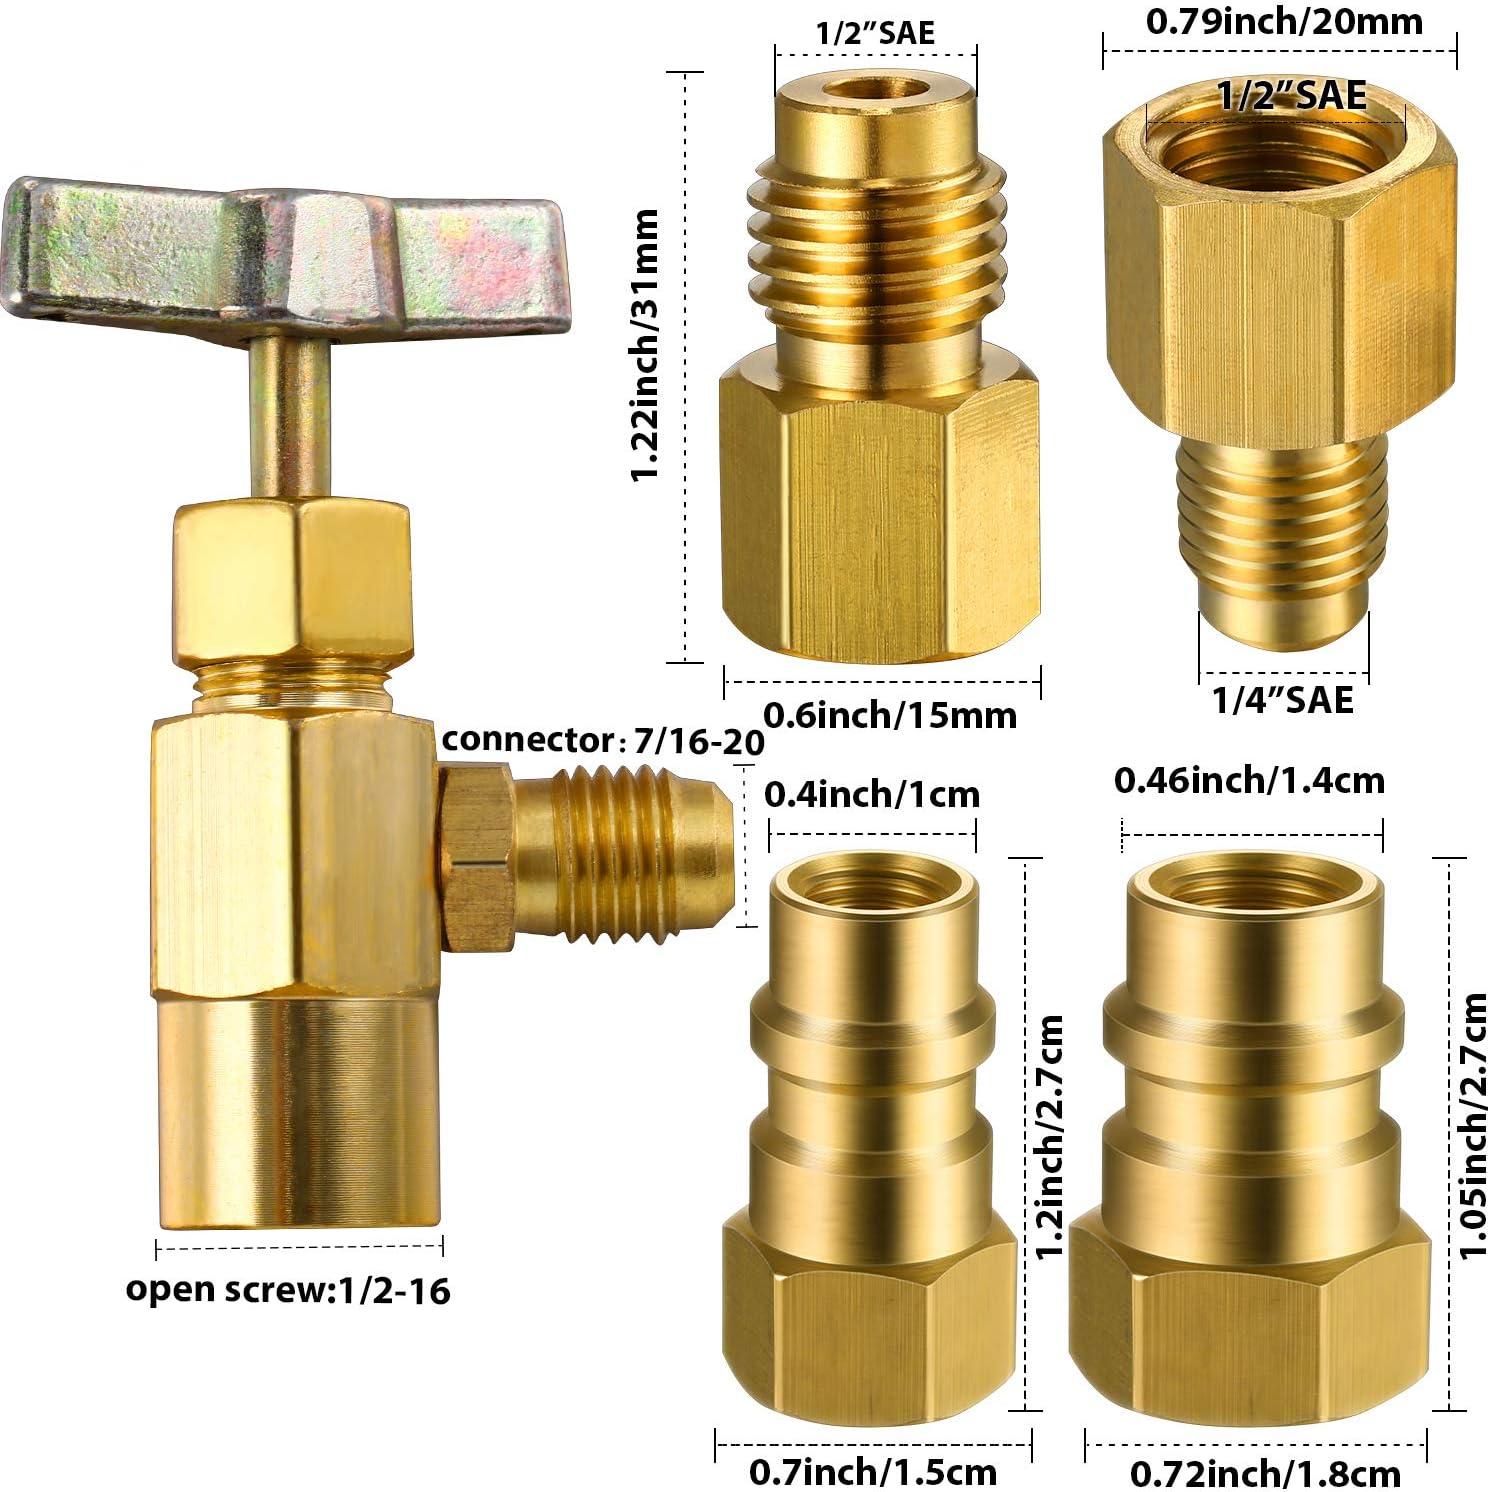 R12 to R134A Conversion Kit BPV-31 Bullet Piercing Tap Valve R134A Refrigerant Opening Valve 8401 Can Tap 6015 6014 Refrigerant Vacuum Pump Adapter Retrofit Valve Convert Adapter for A//C Refrigerant